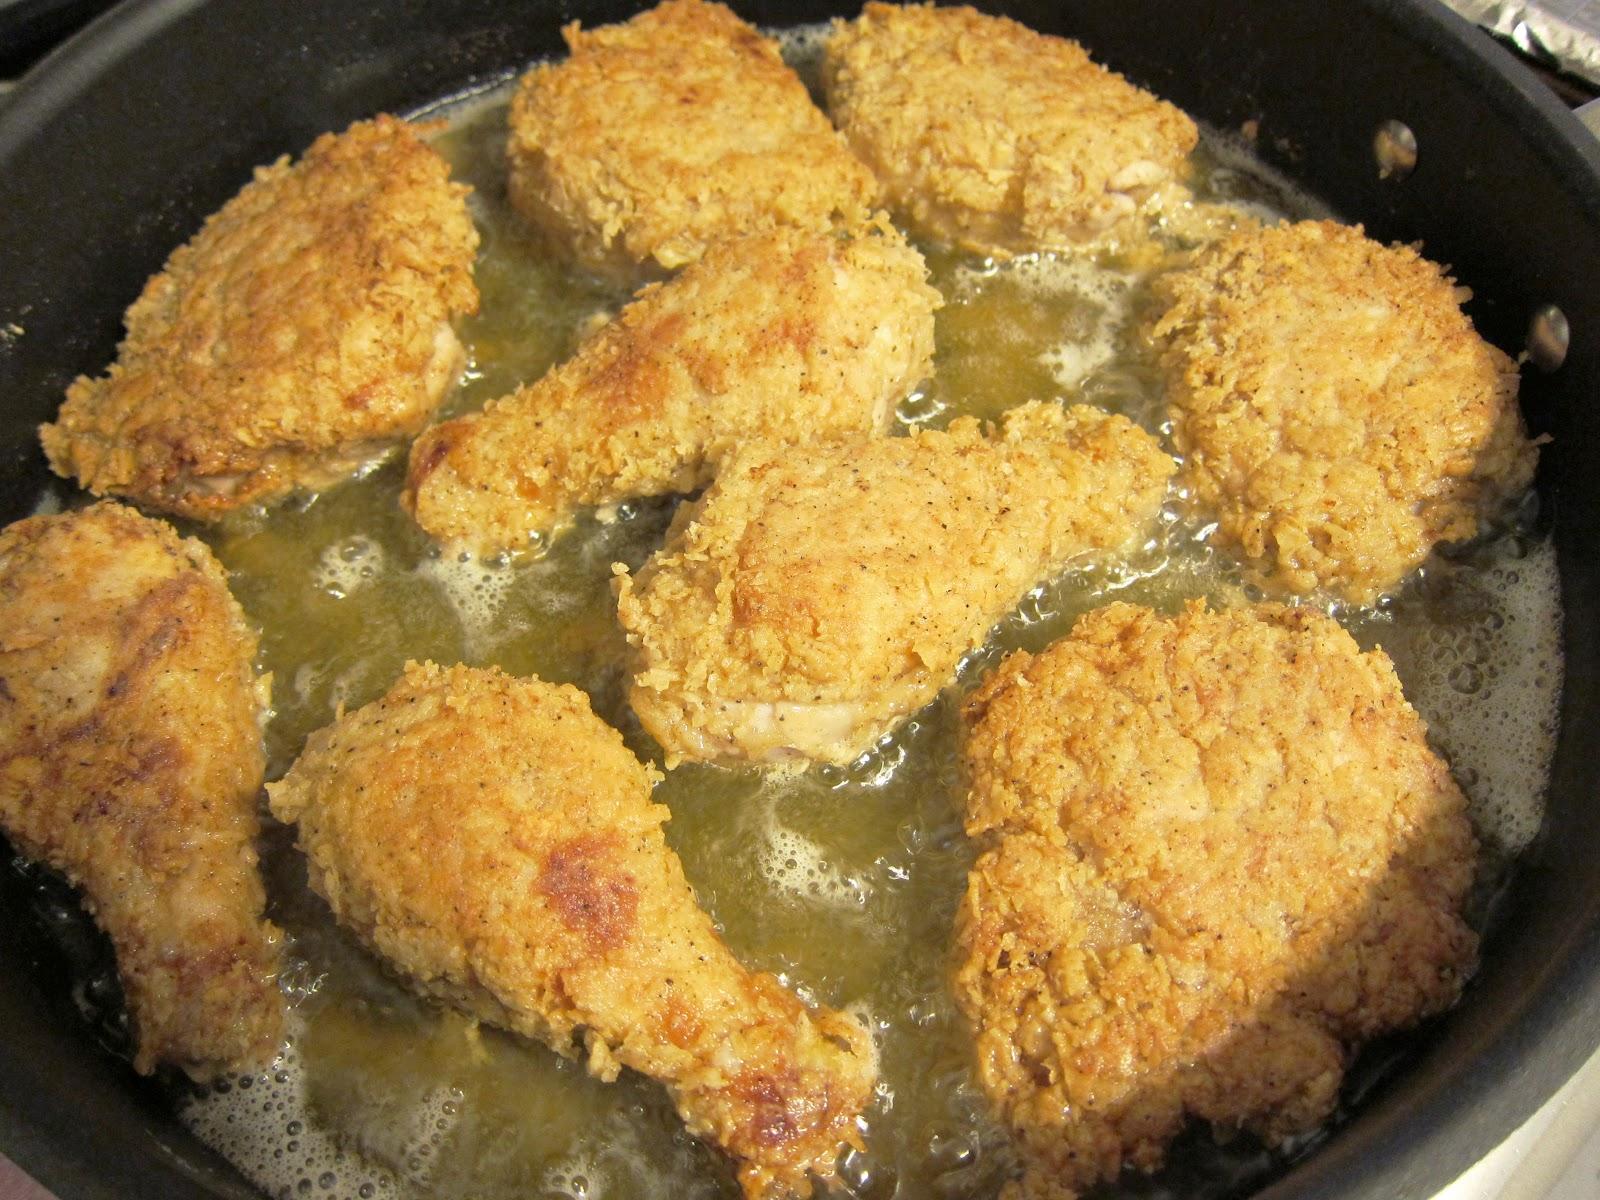 Bloatal Recall Easier Fried Chicken